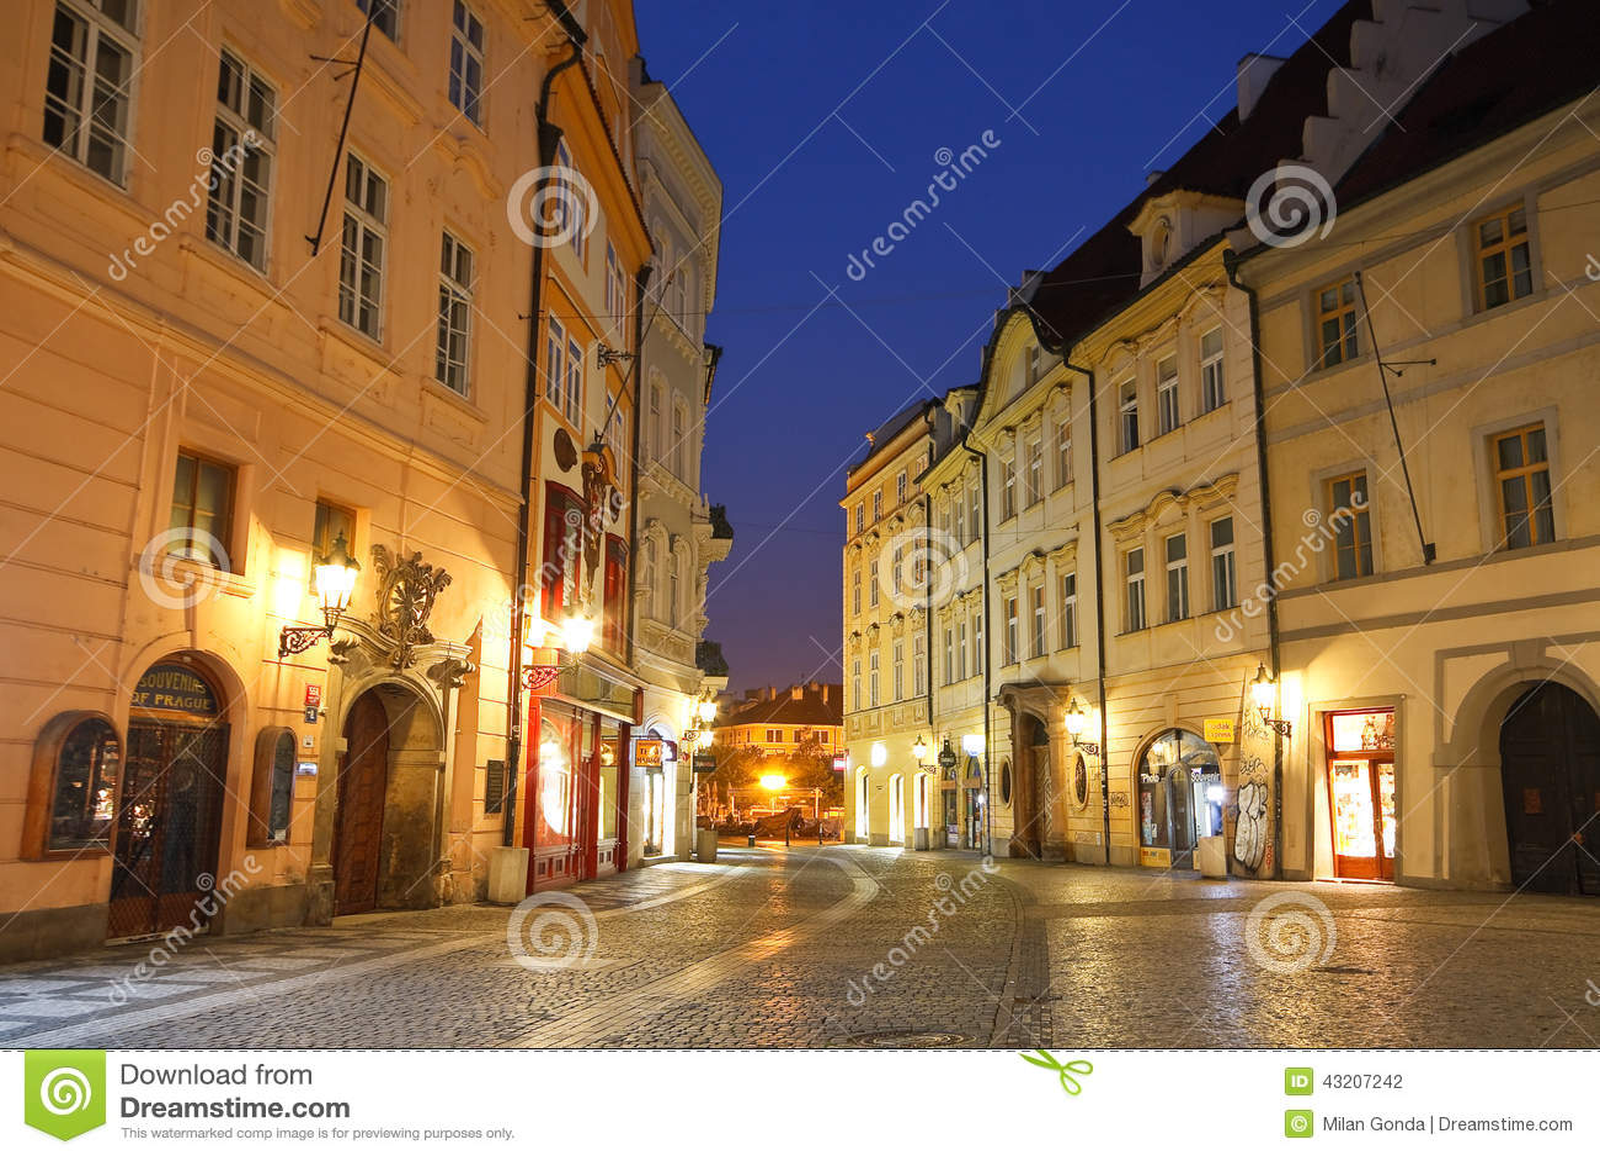 Download Prague tjeckisk republik redaktionell arkivbild. Bild av stad - 43207242